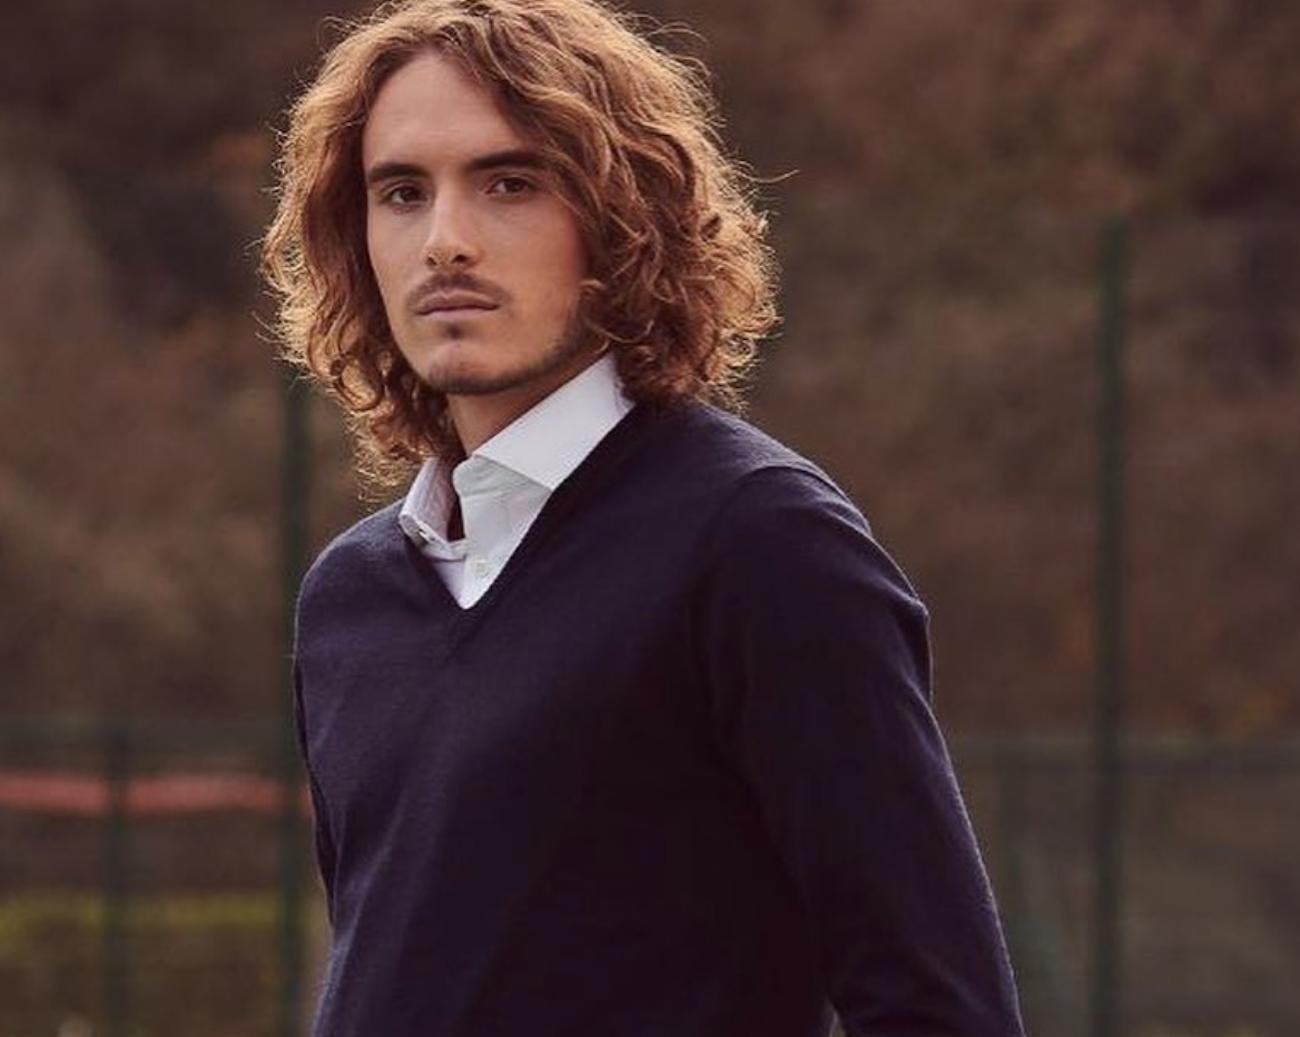 Stefanos Tsitsipas Cheveux Cheveux Longs